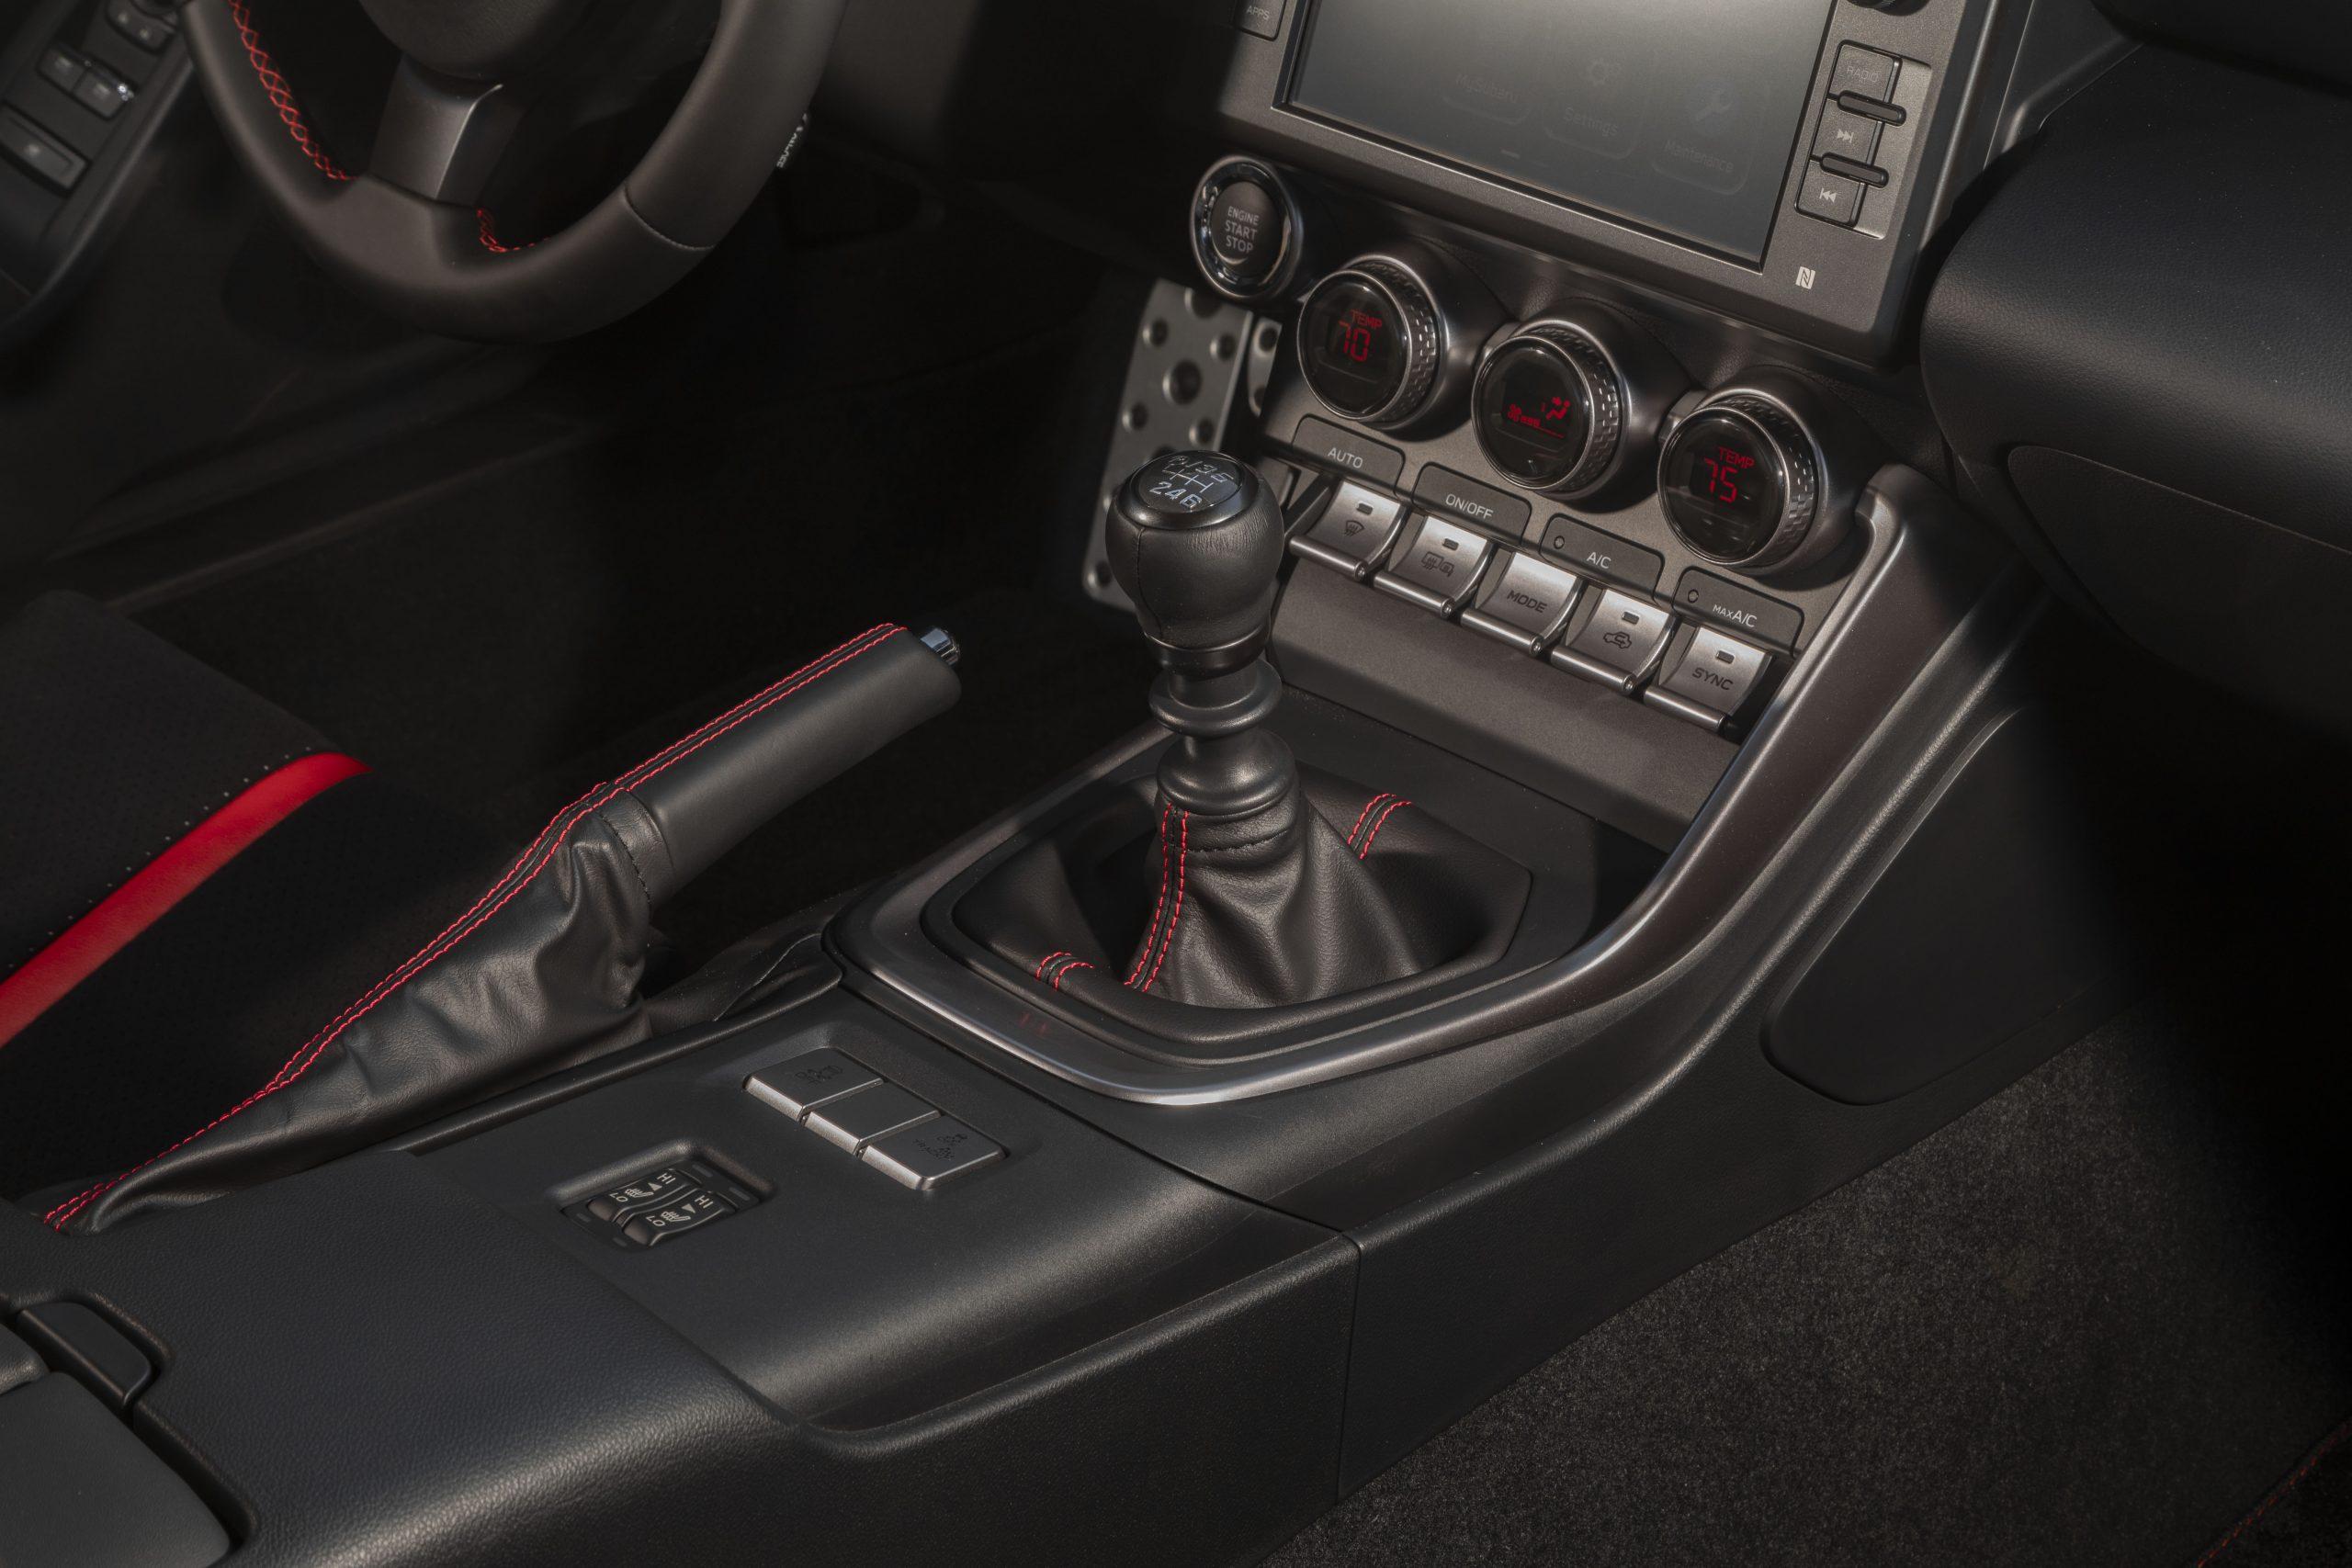 2022 Subaru BRZ interior center console